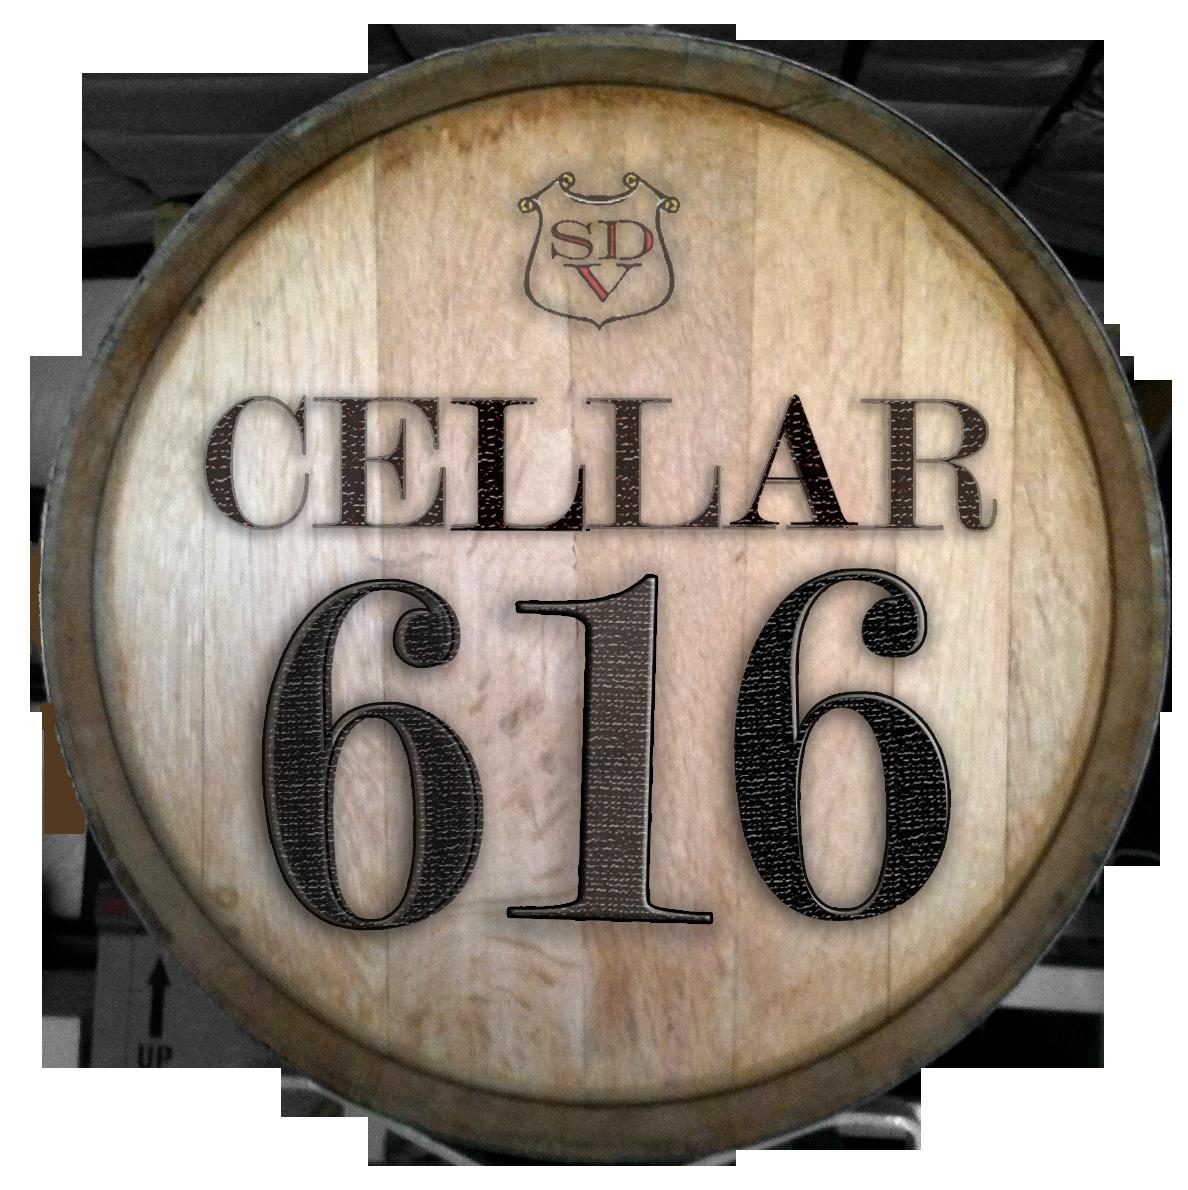 Cellar 616